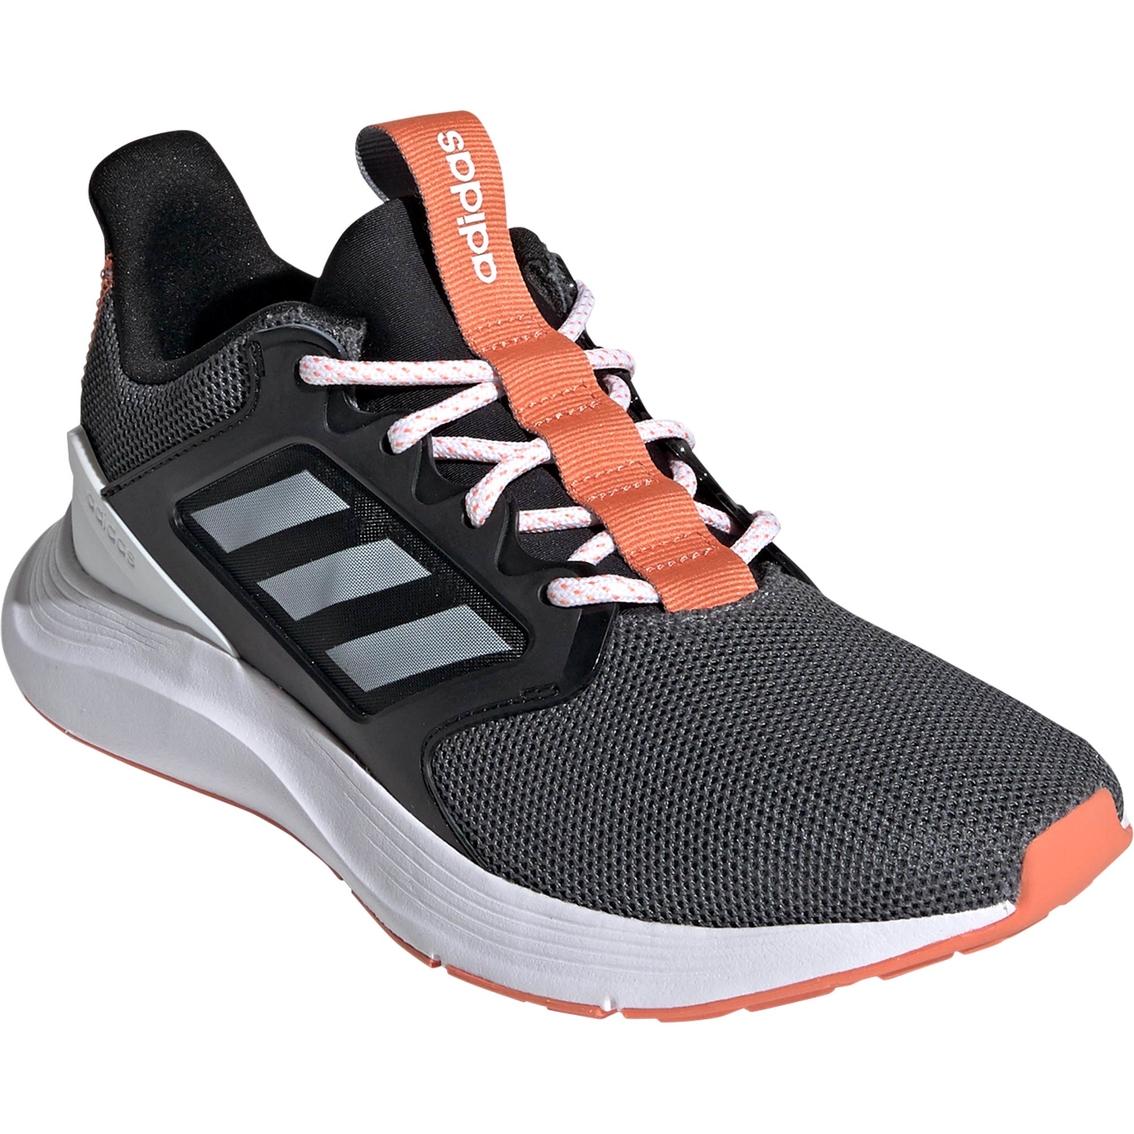 Adidas Women's Energyfalcon X Running Shoes | Running